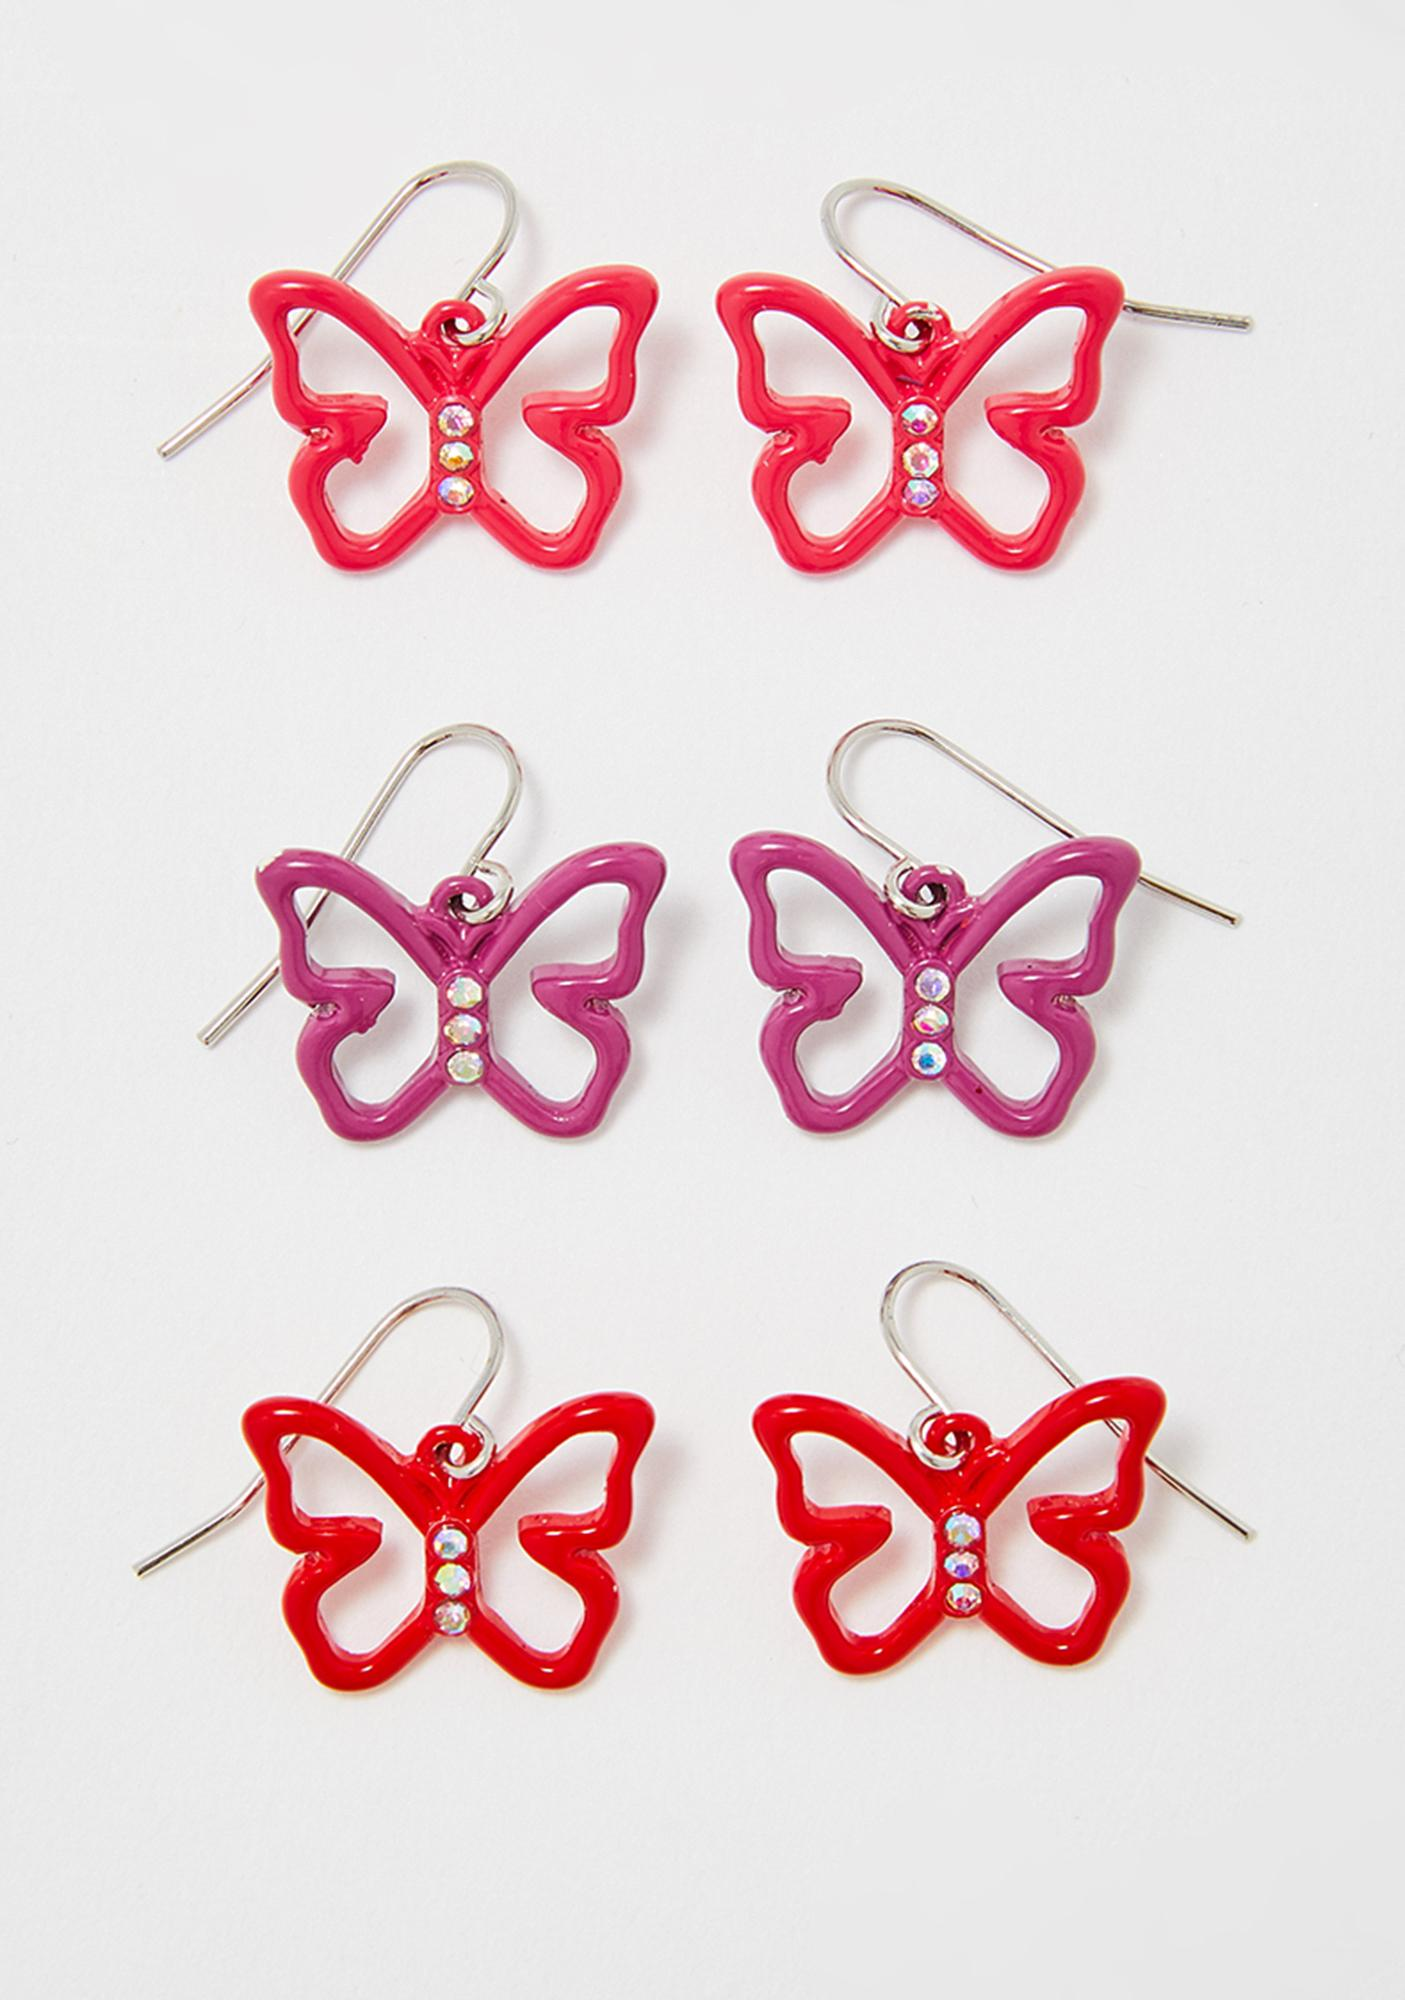 Butterfly Bling Earring Set